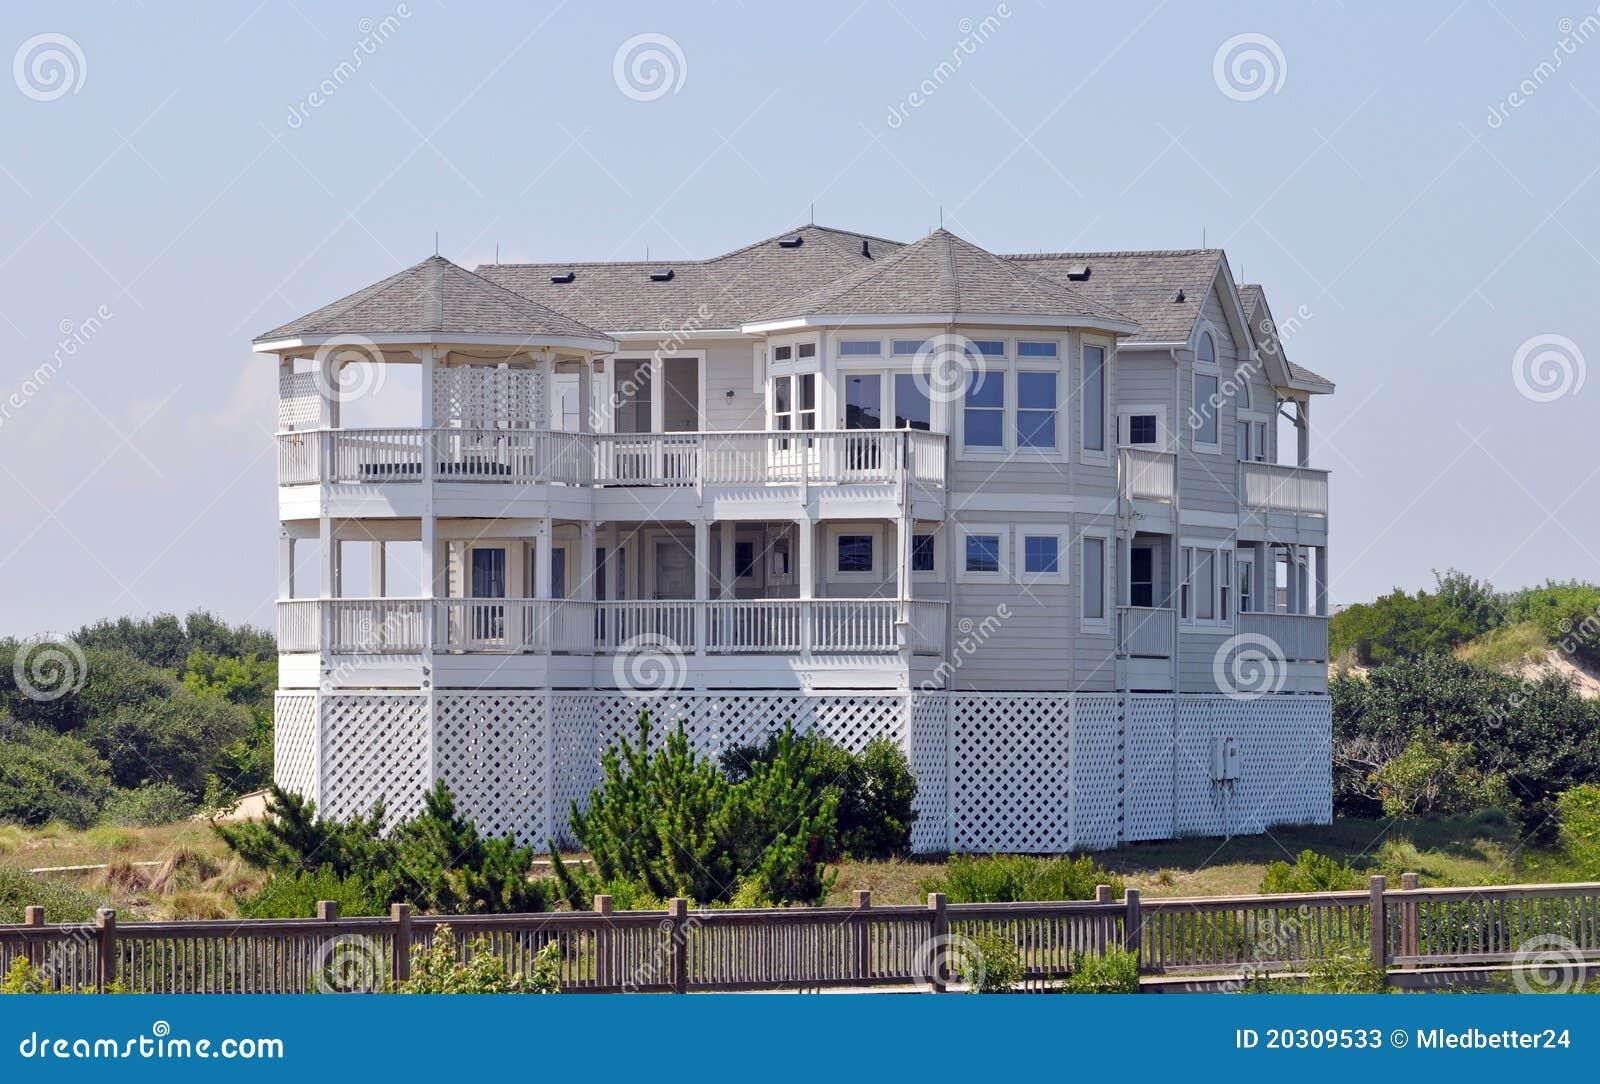 Beach house in north carolina stock image image 20309533 for Carolina house